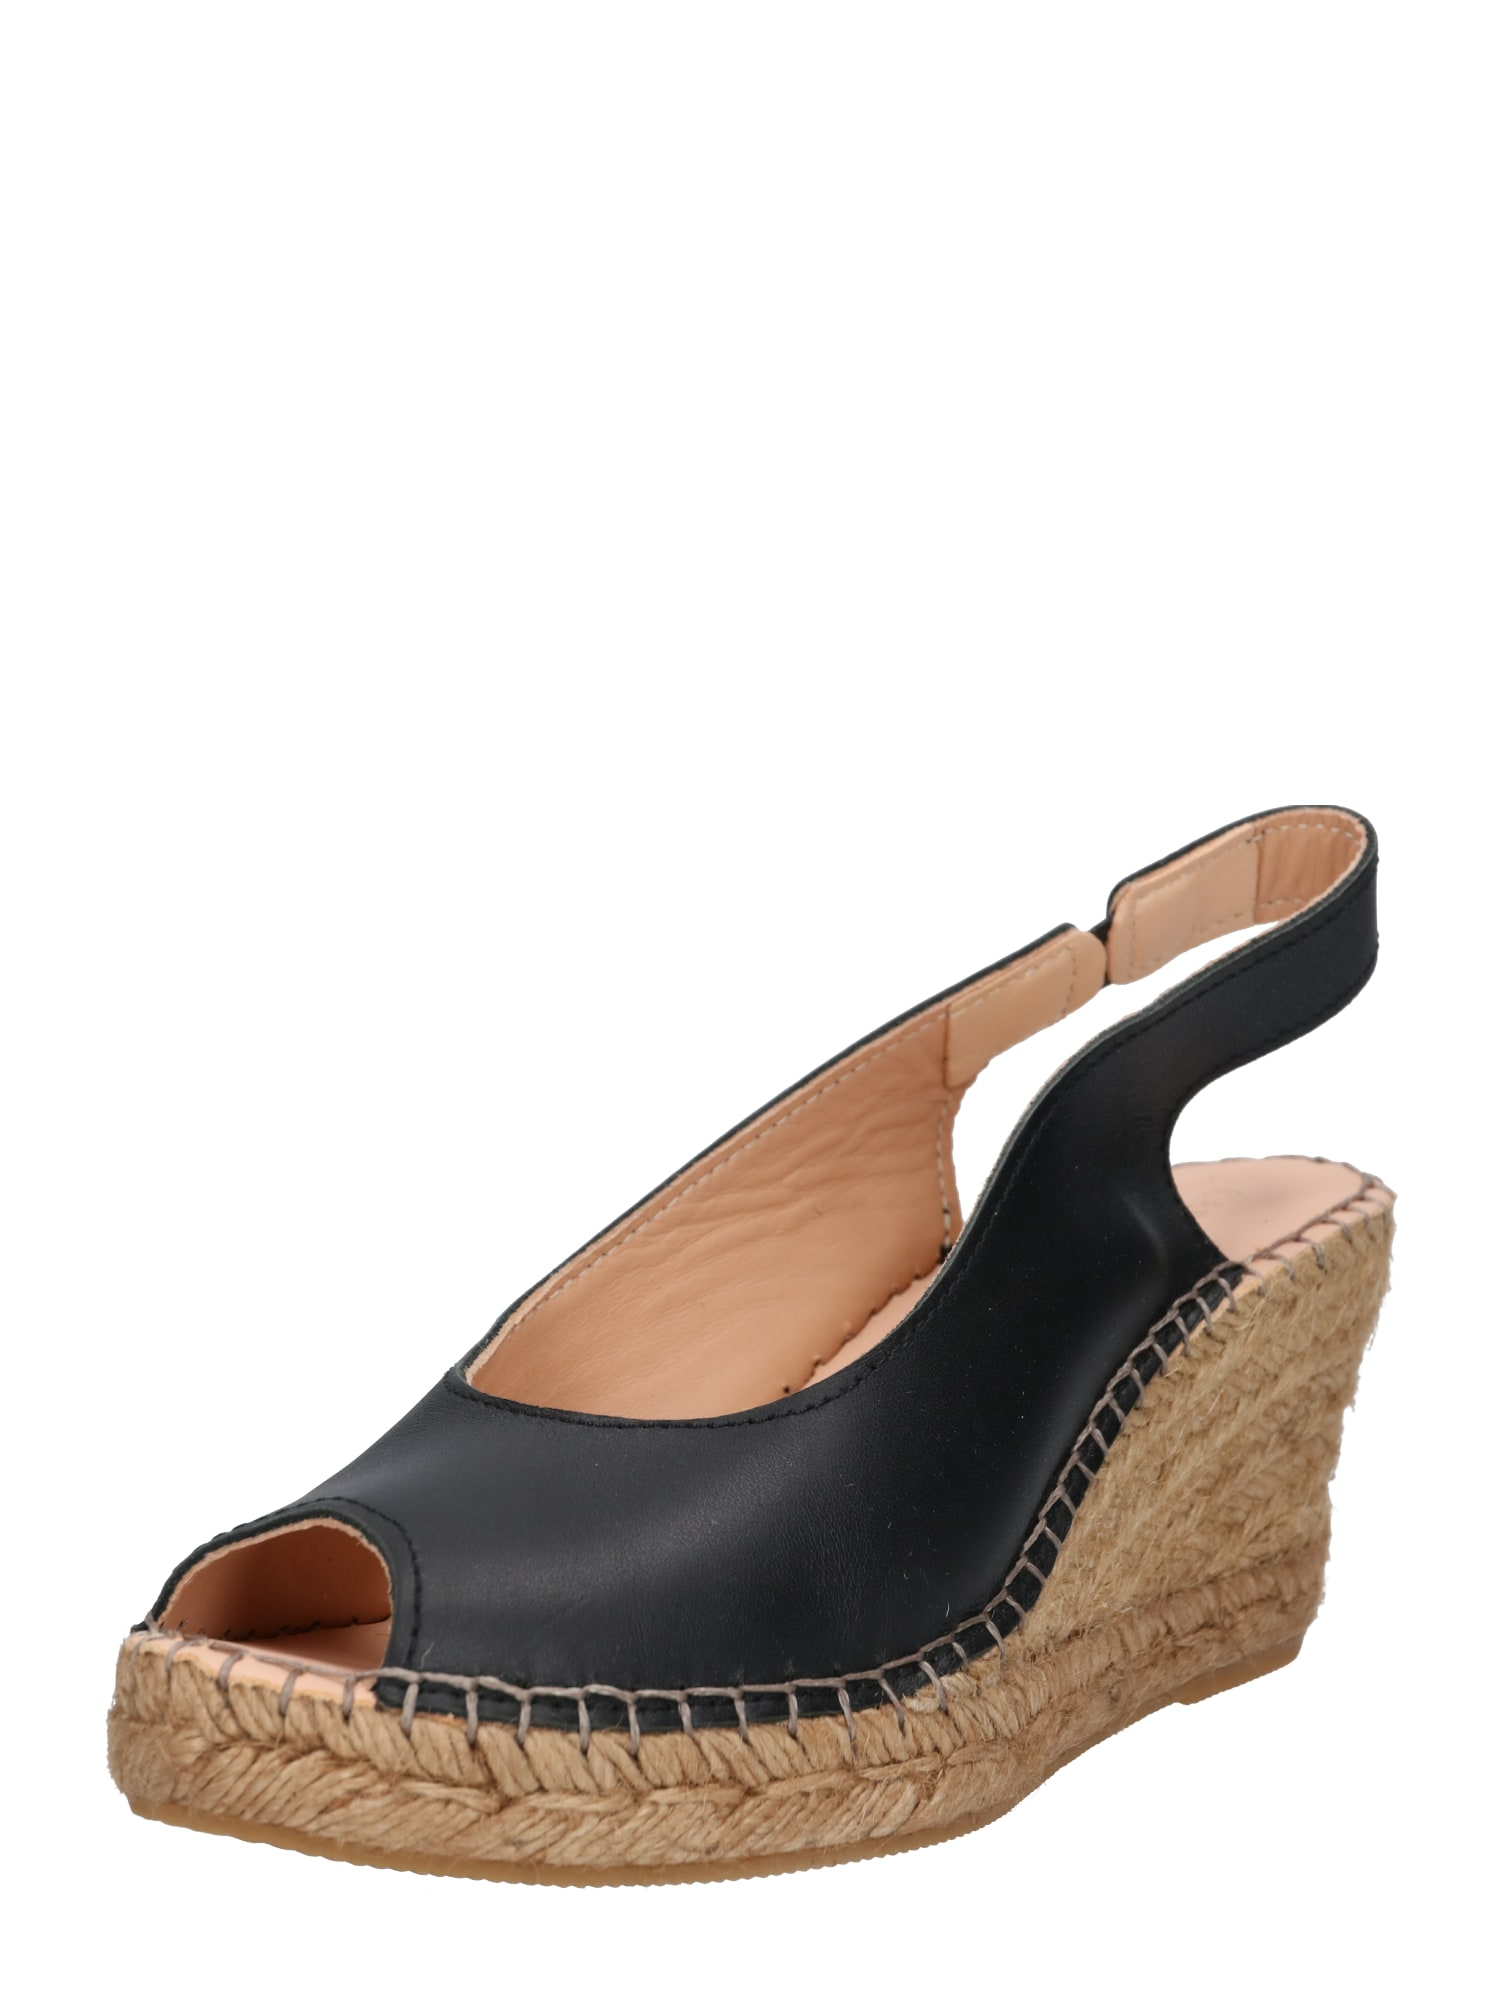 Sandály SHARON černá Carvela By Kurt Geiger